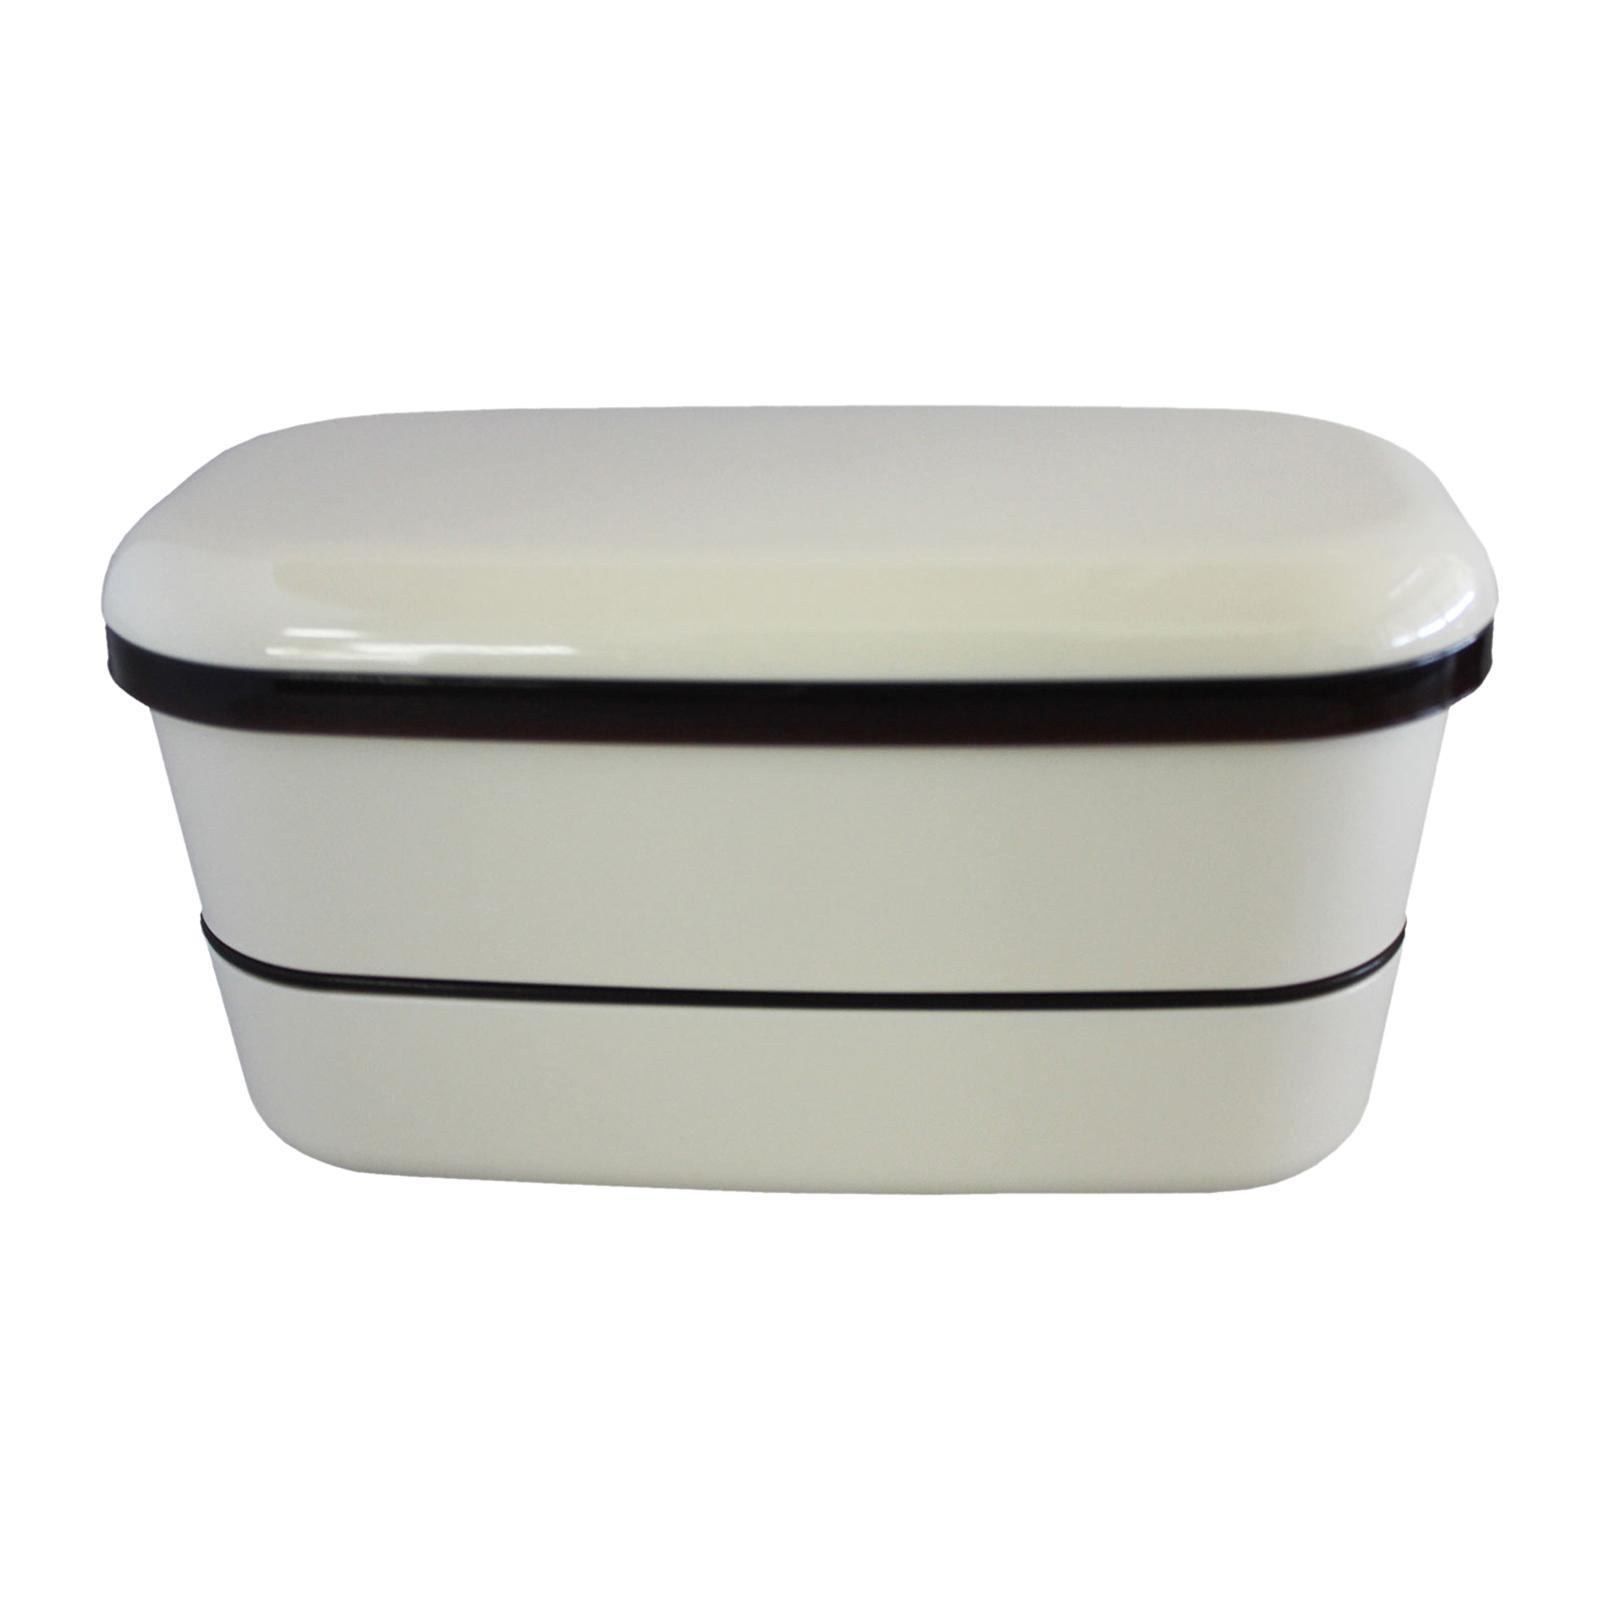 Yamada 2 Tier Lunch Box / Bento Box - Beige